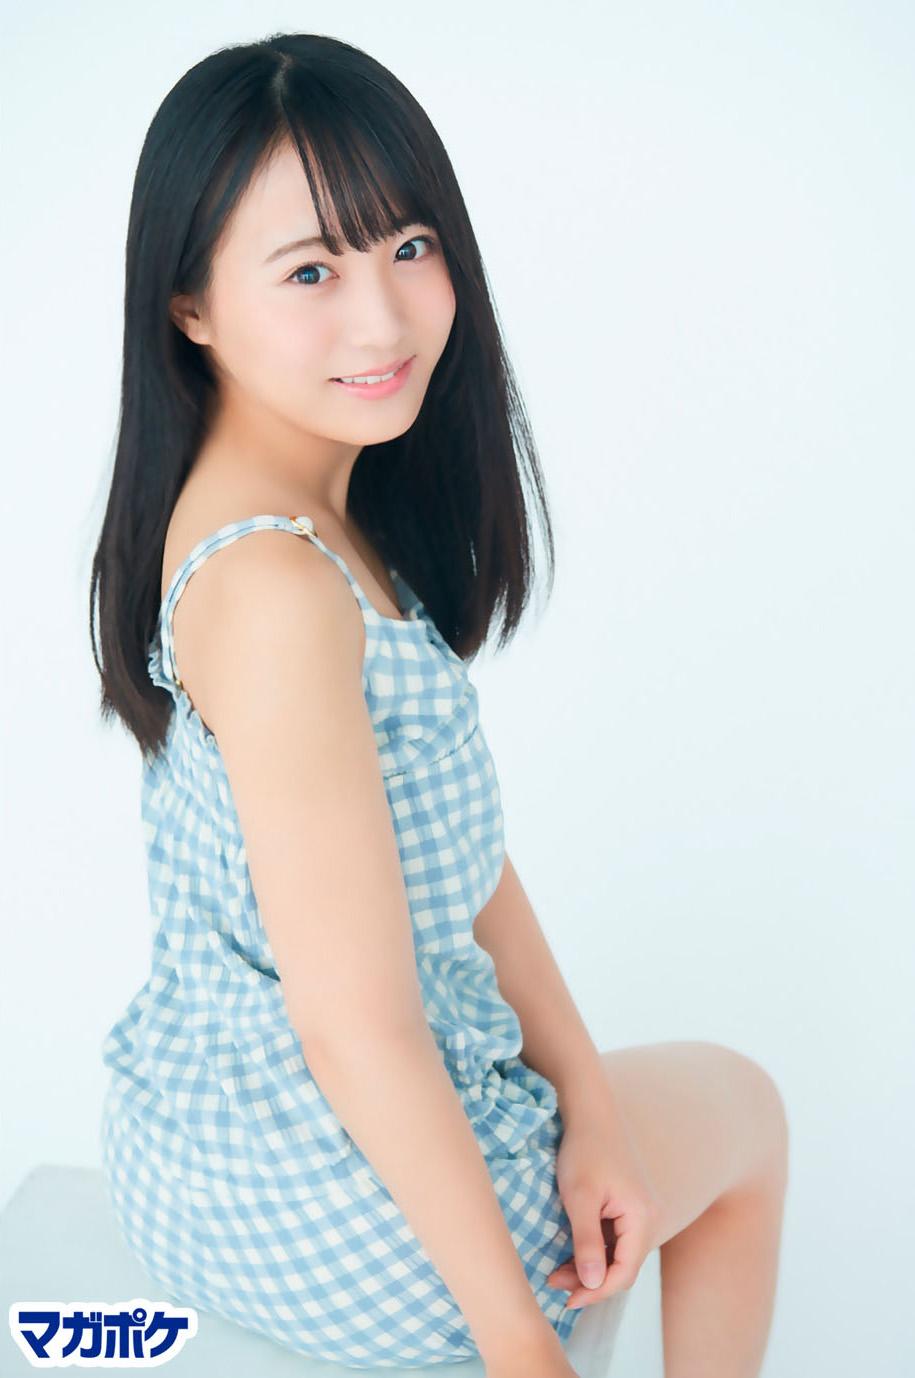 Sakaguchi Nagisa 坂口渚沙, AKB48 Team8 x Weekly Maga Cover Competition